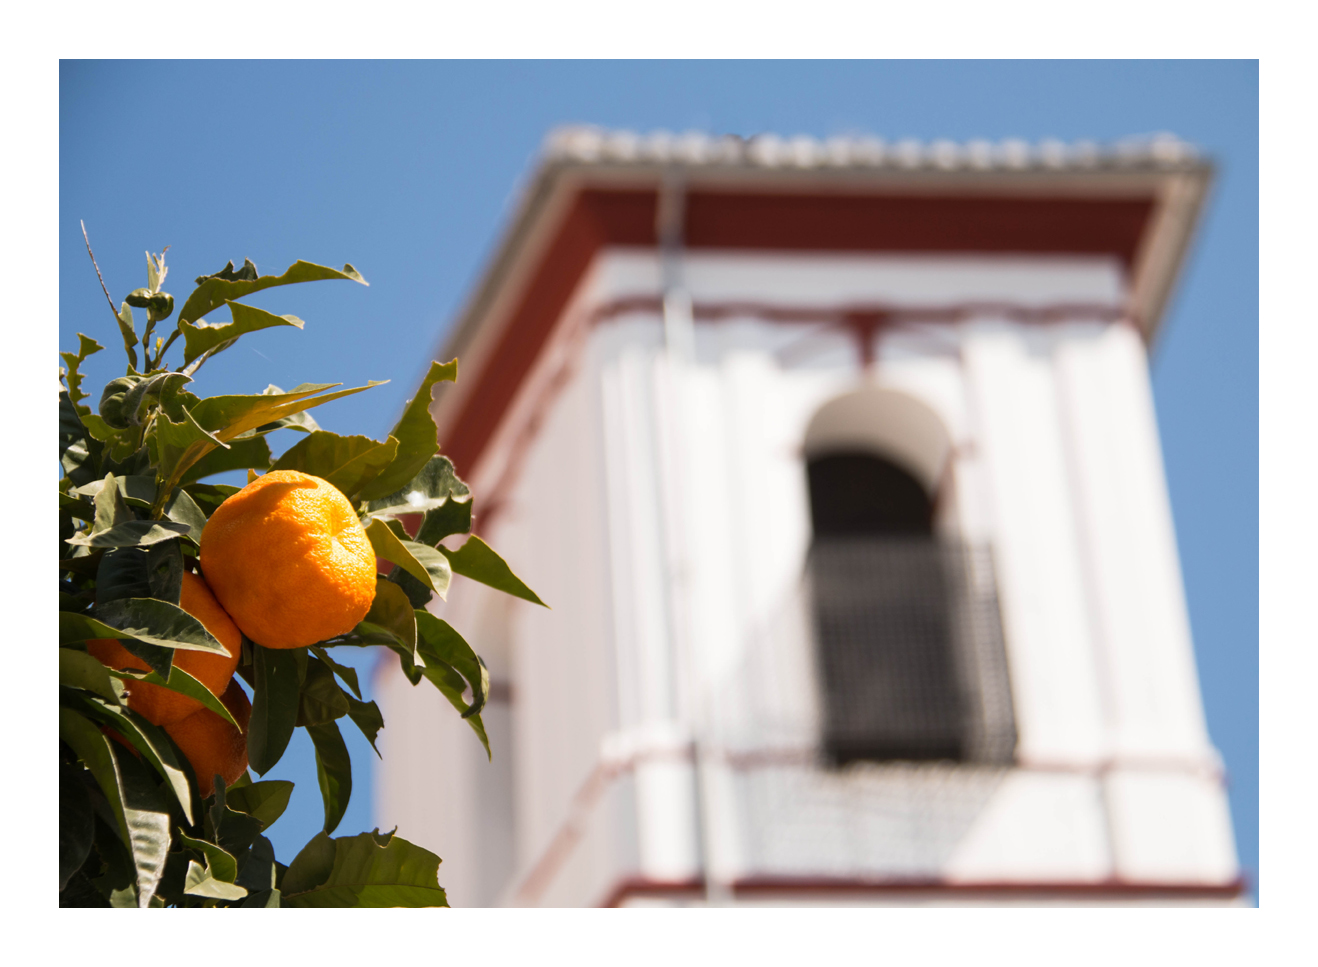 Pommeranzen in Granada